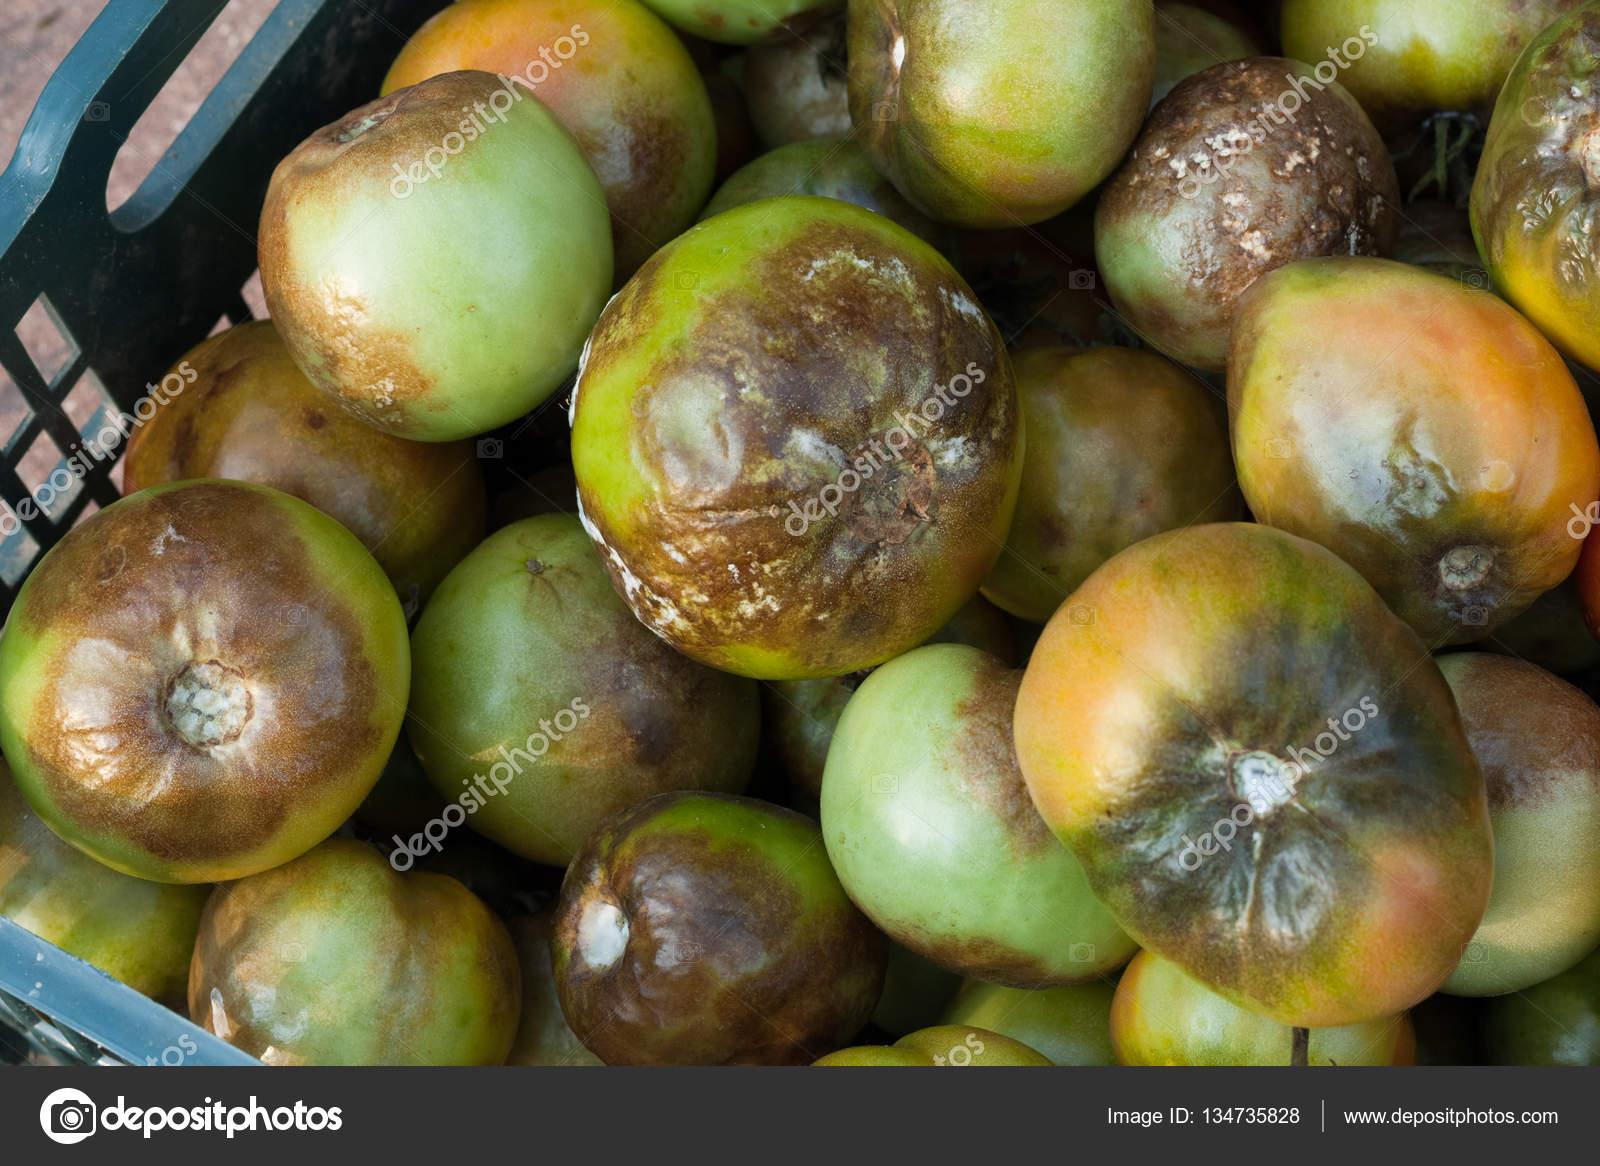 Malattie del pomodoro foto stock elena mas 134735828 for Malattie pomodoro